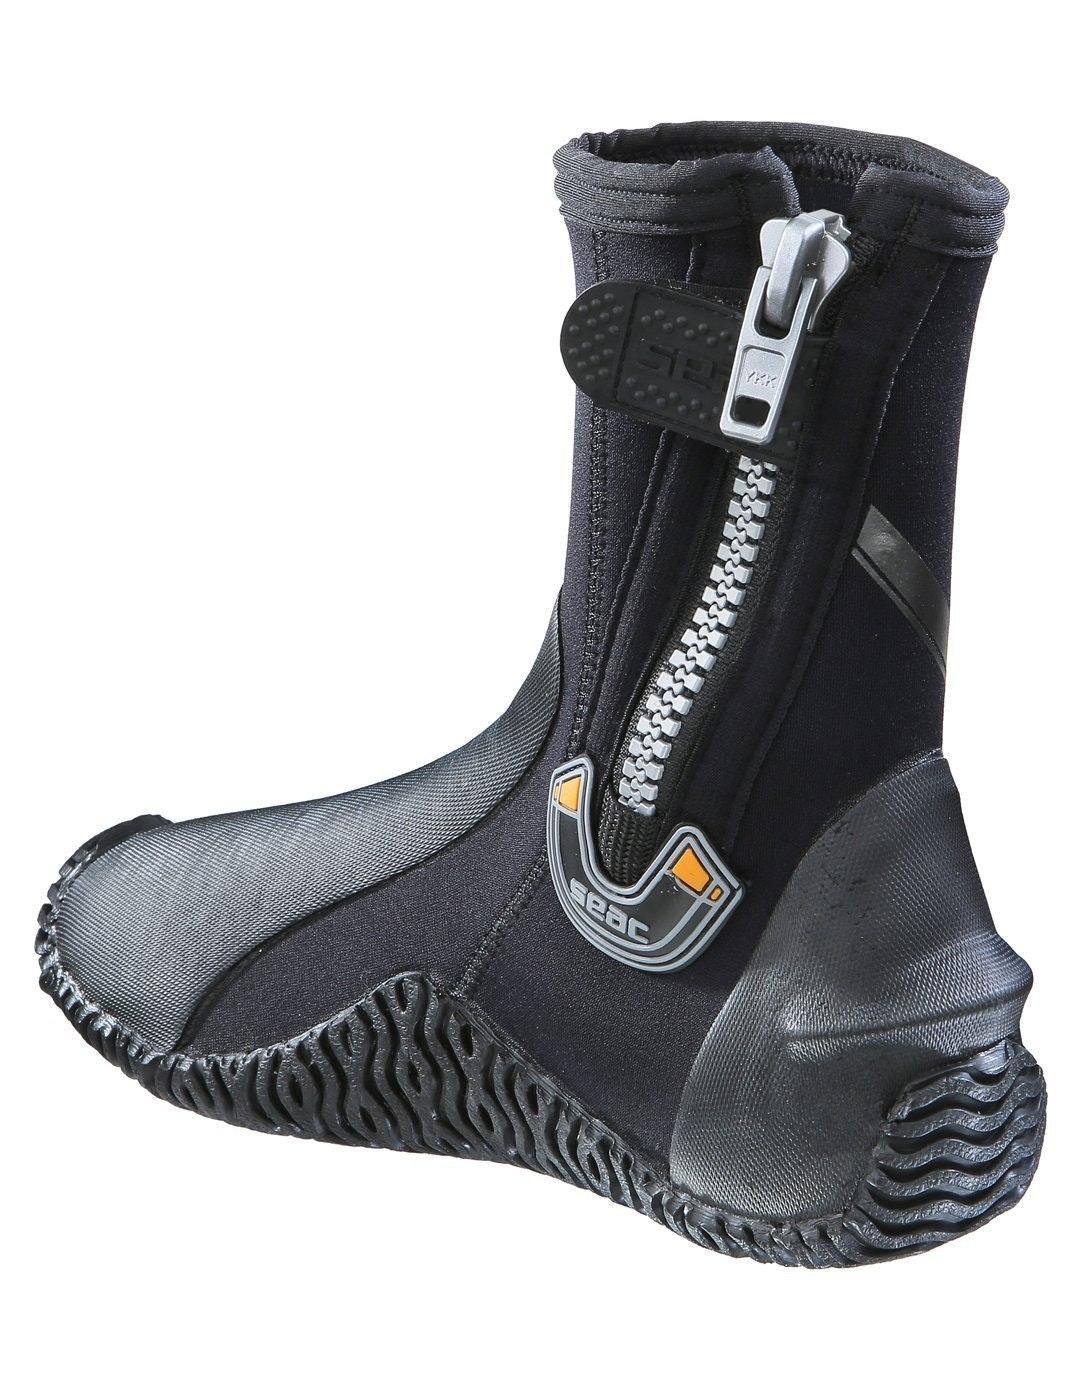 SEAC Pro HD Hard Sole Scuba Boots